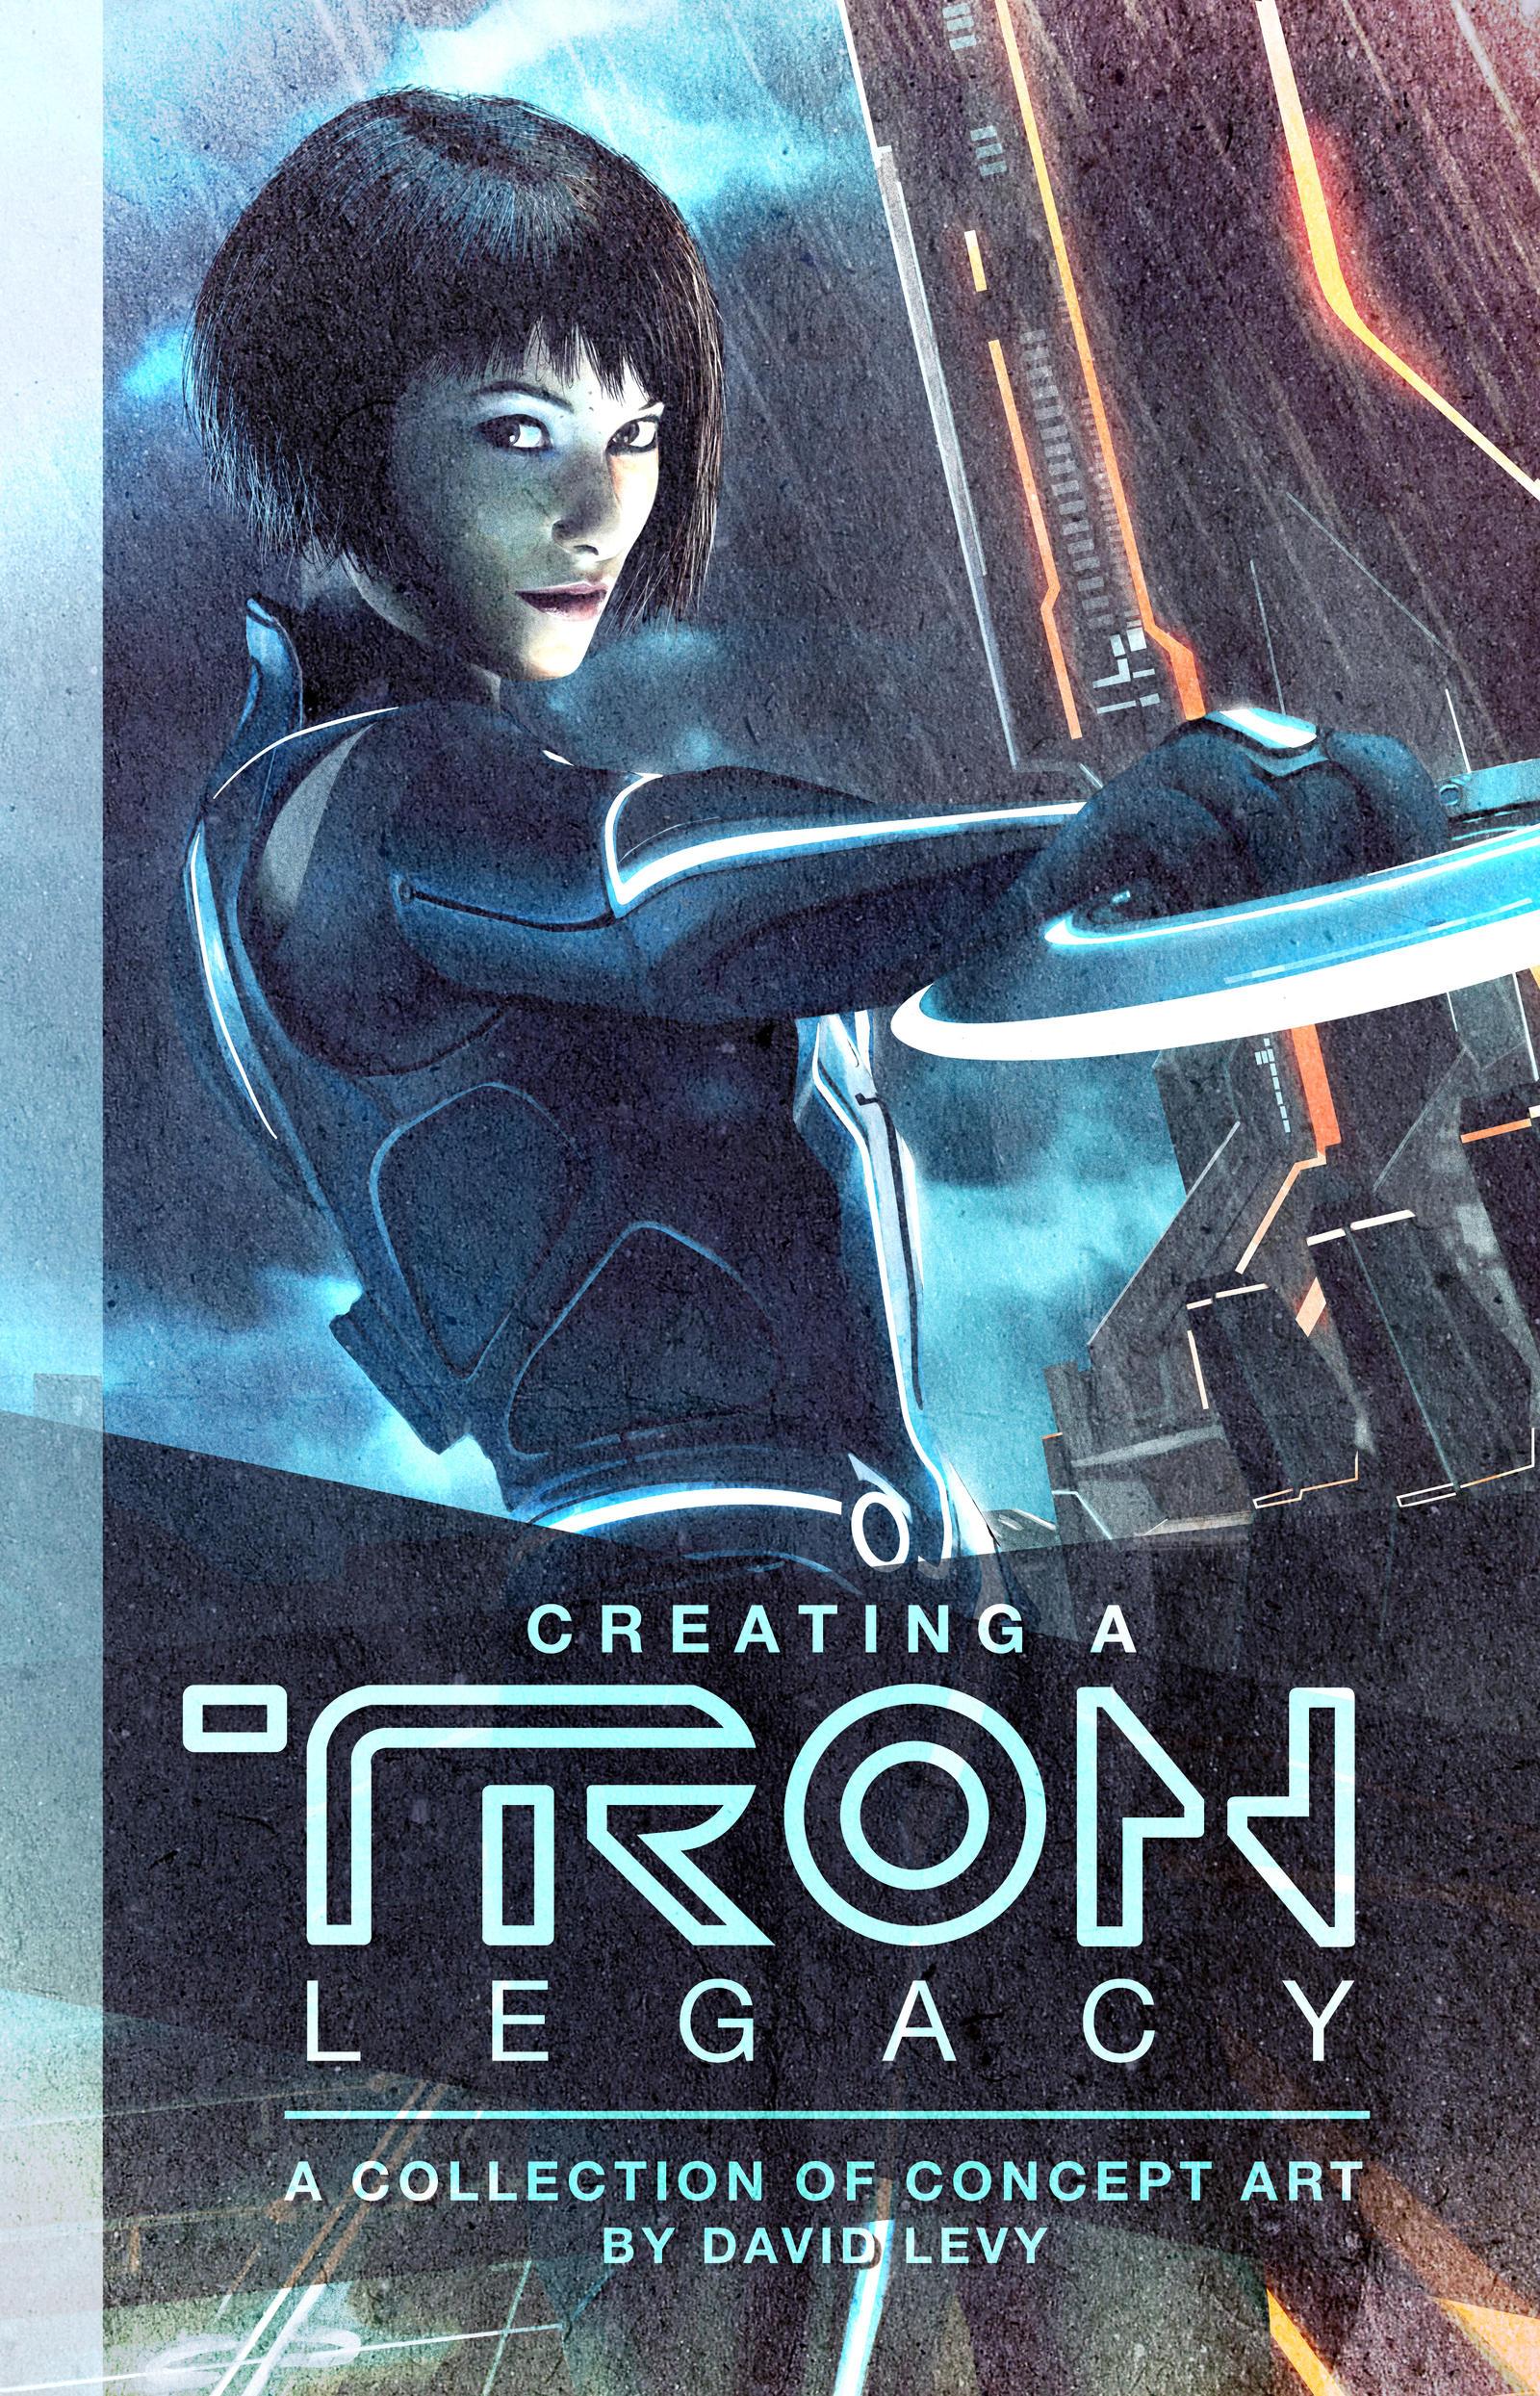 Tron Legacy Book Cover Design